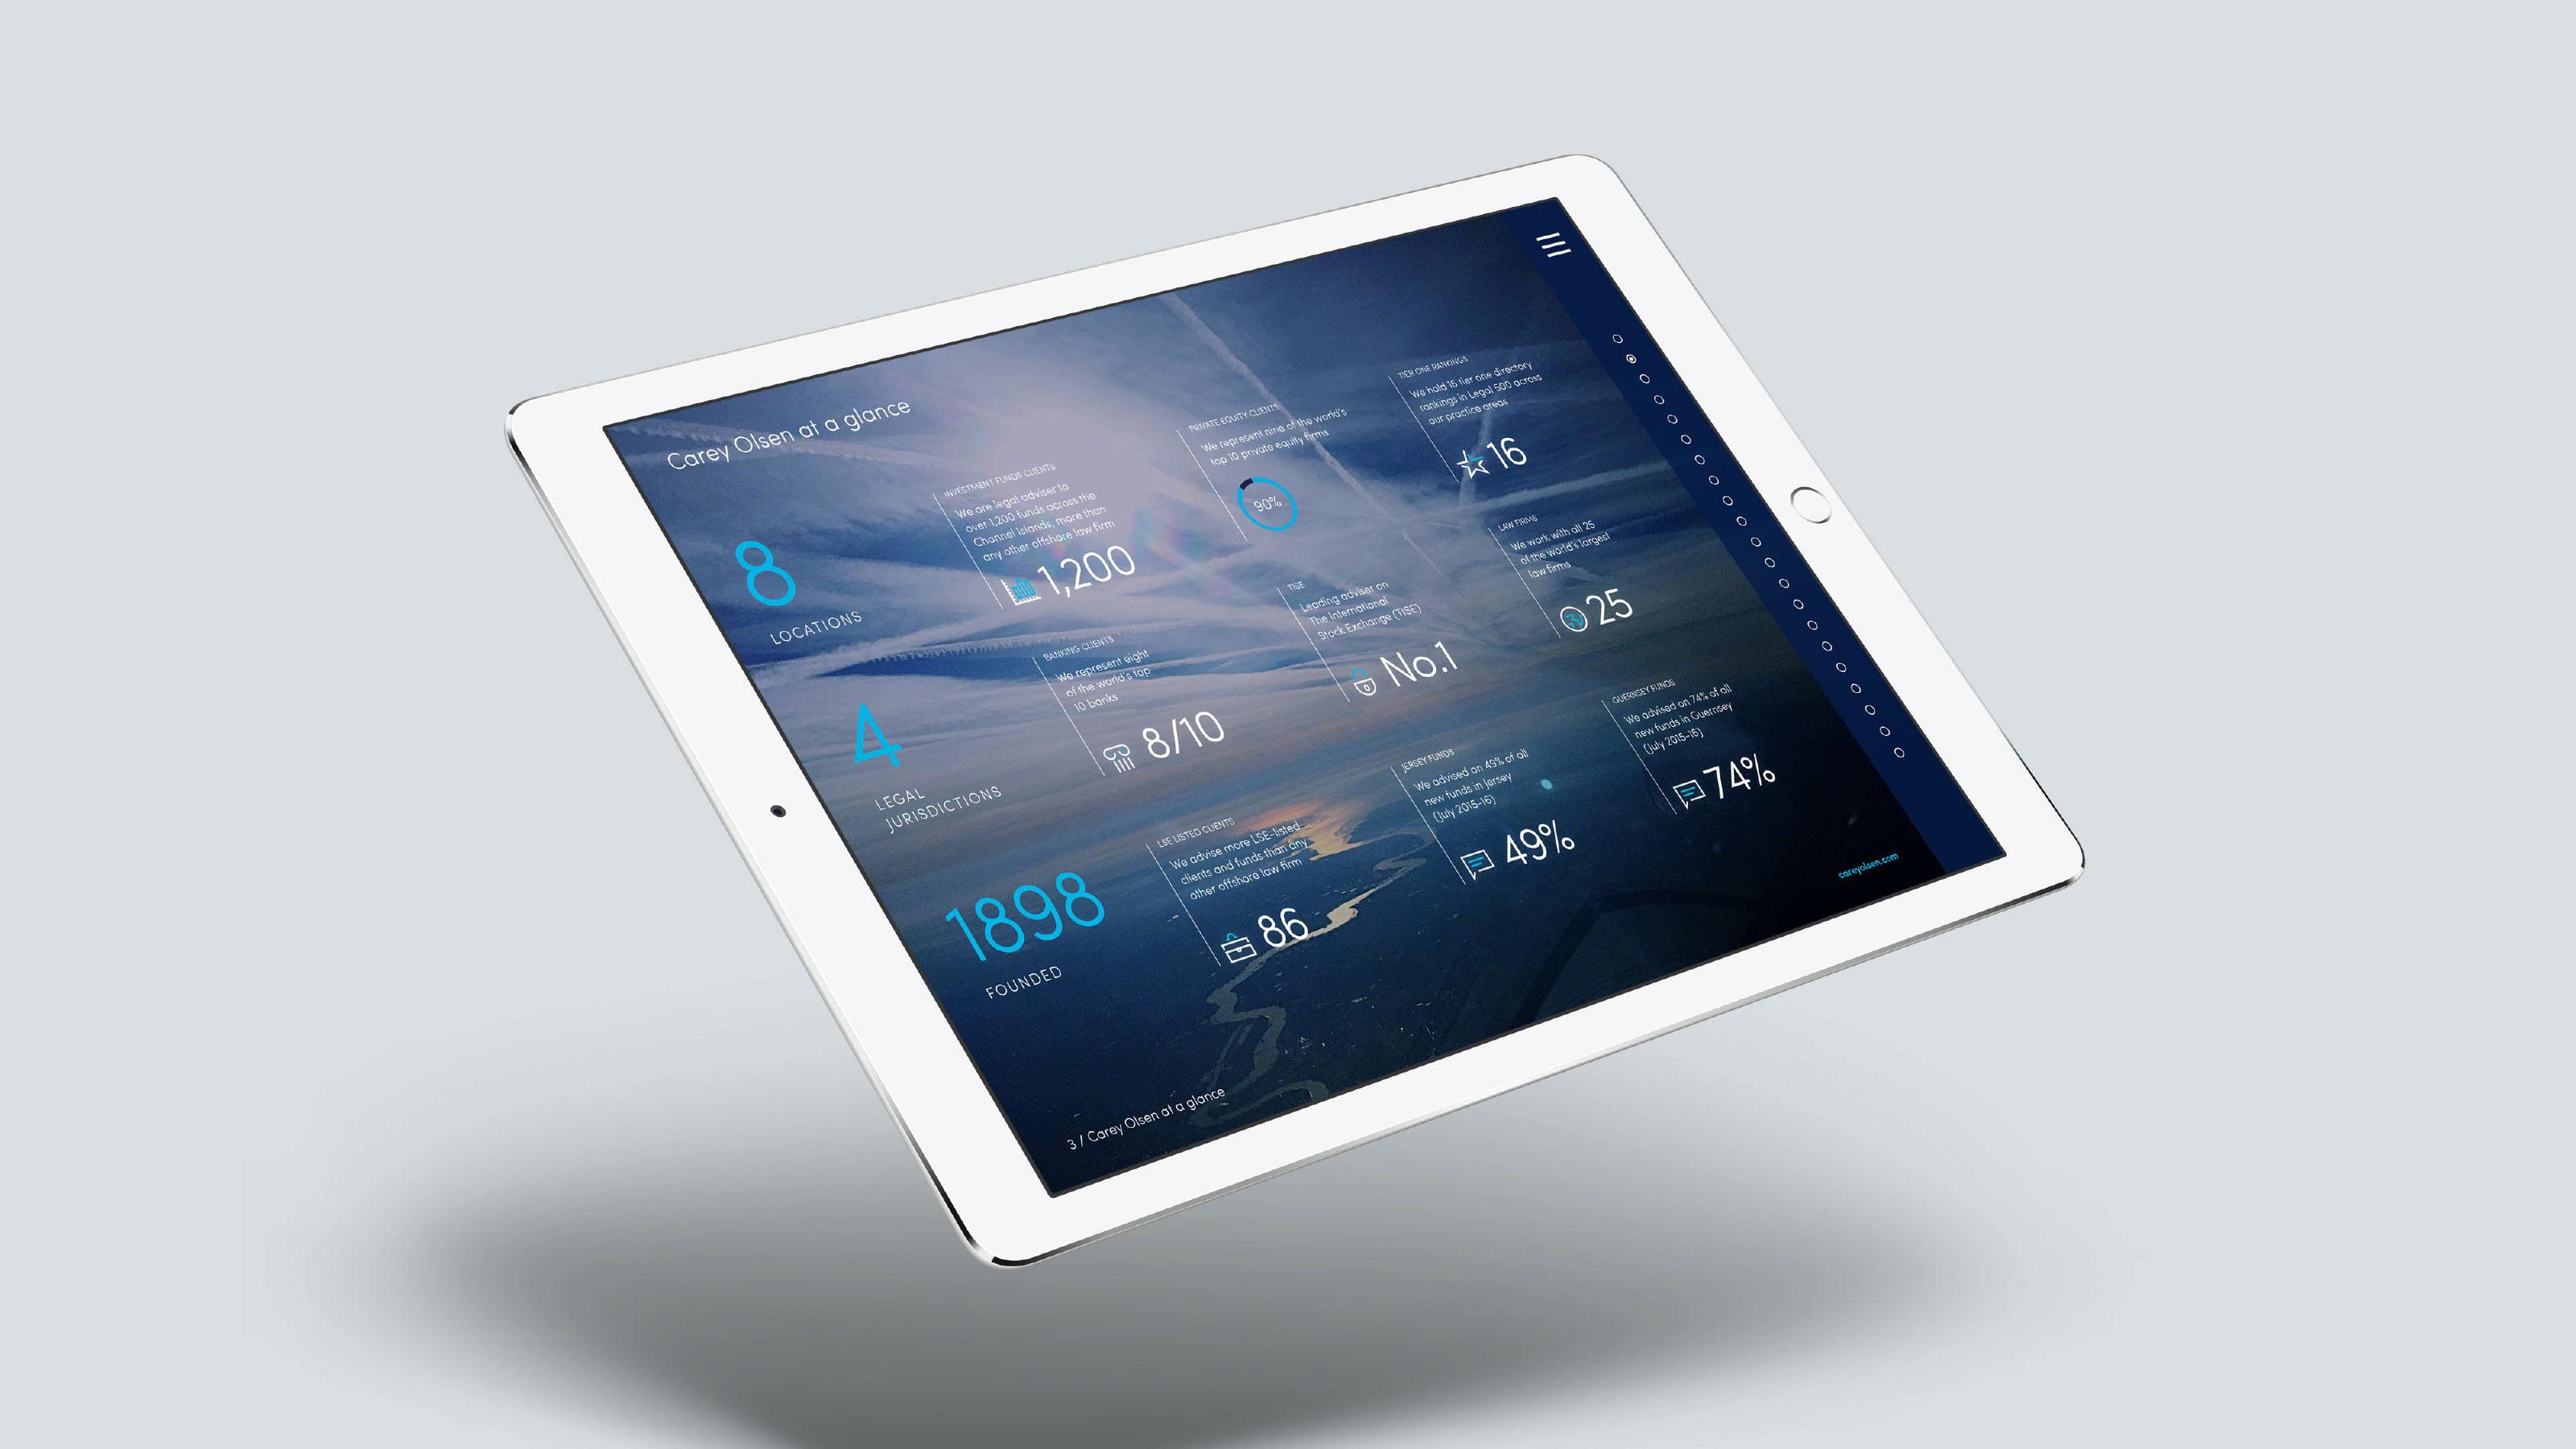 Marketing tablet screen Carey